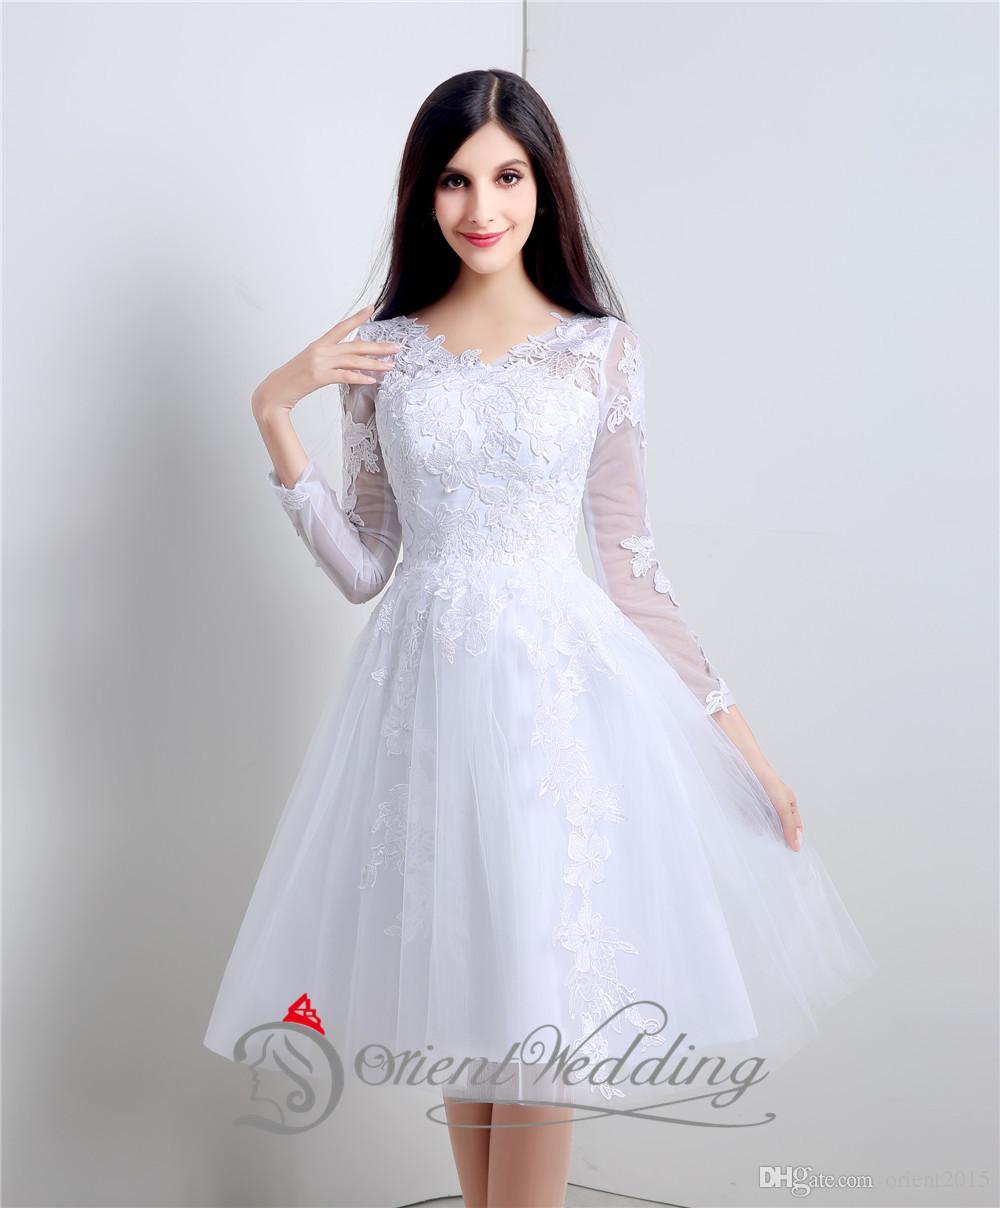 En existencia Negro / Marfil V cuello de manga larga de encaje de la  boda vestido